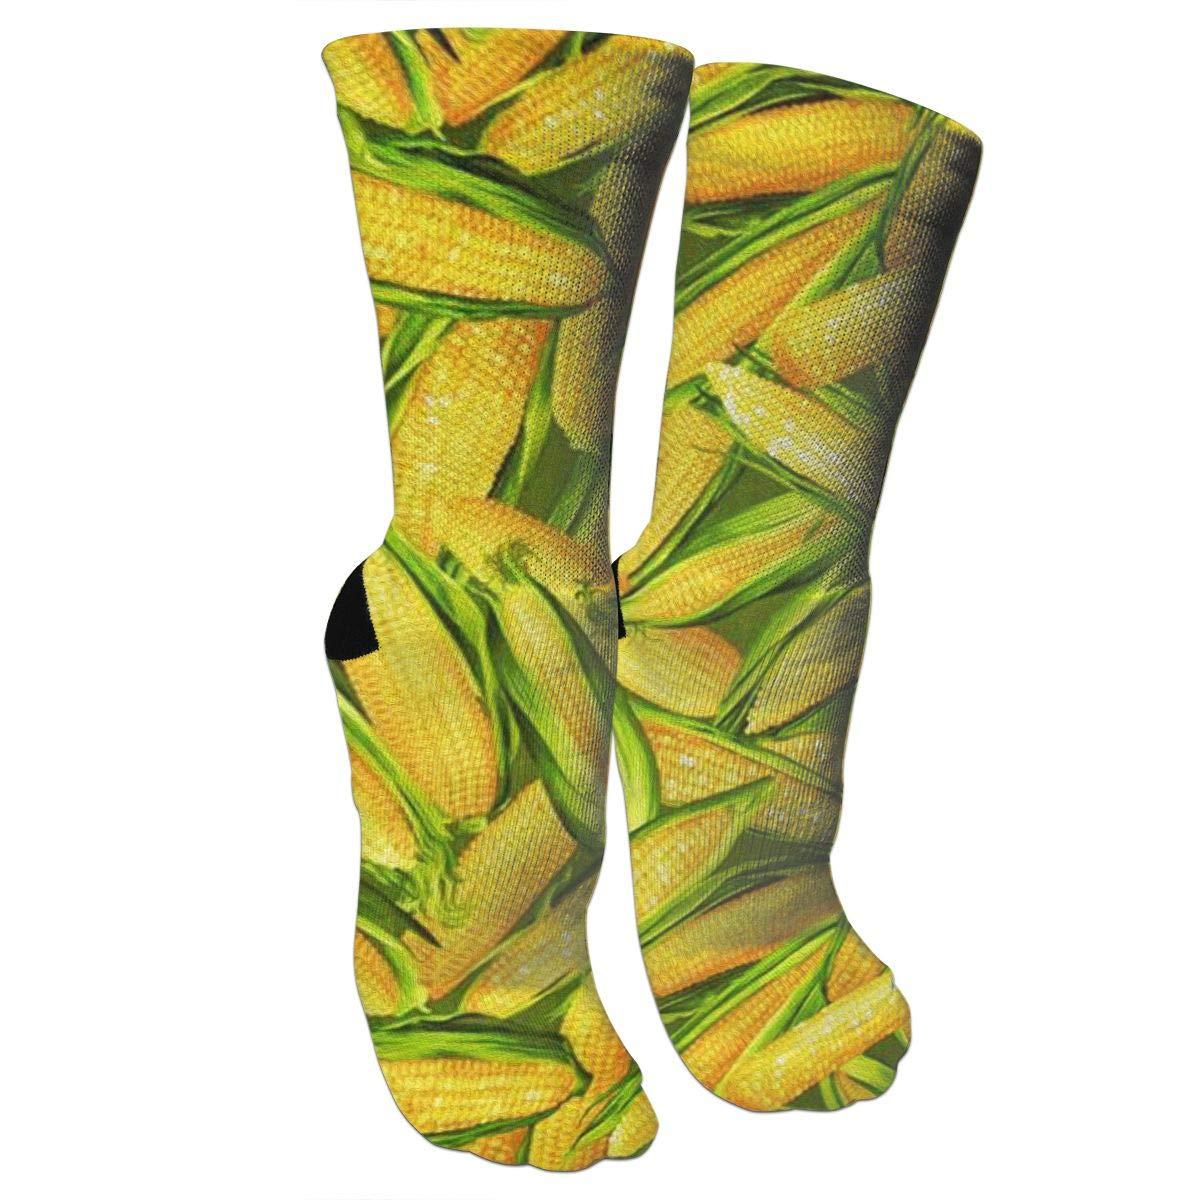 Amazon.com: Miaowow Mature Corn High Socks Crew Sock Crazy ...